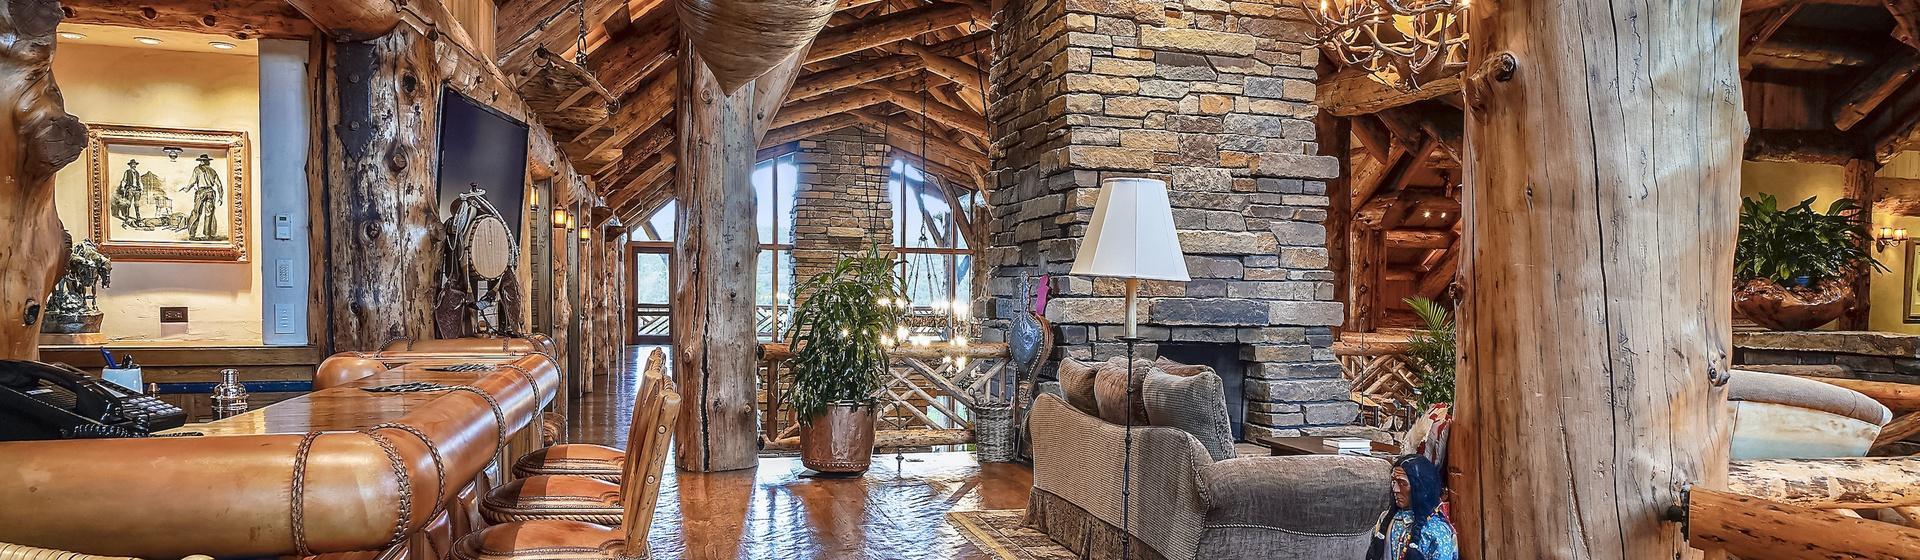 6.4-Telluride-Sleeping-Indian-Ranch-second-floor-landing-bar-web.JPG